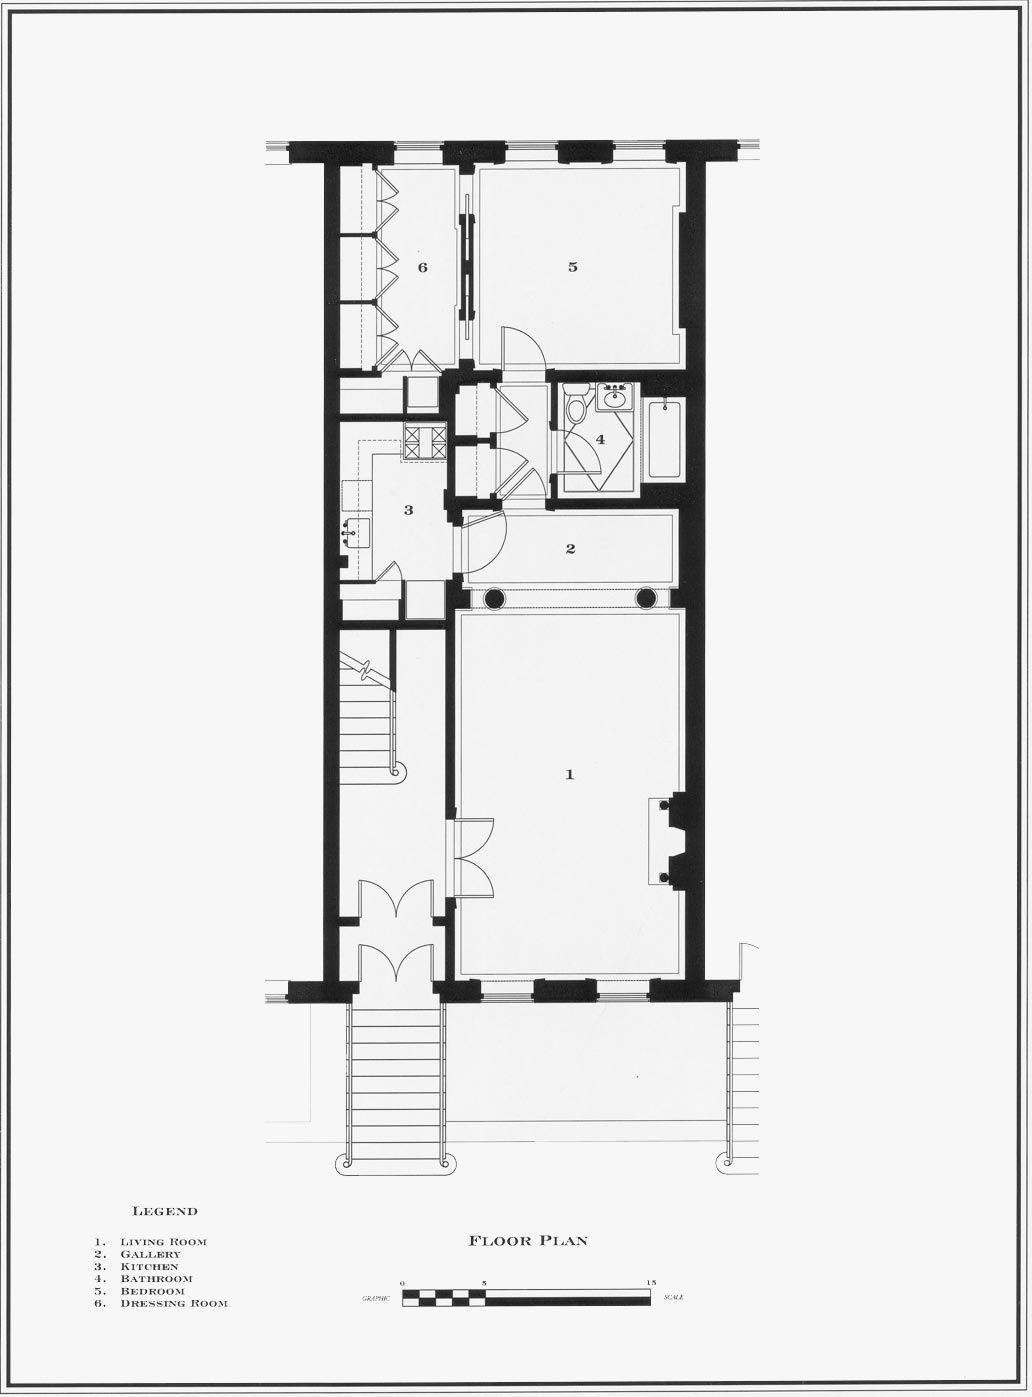 g p schafer architect pllc town house floor plan plan design city living  [ 1032 x 1397 Pixel ]